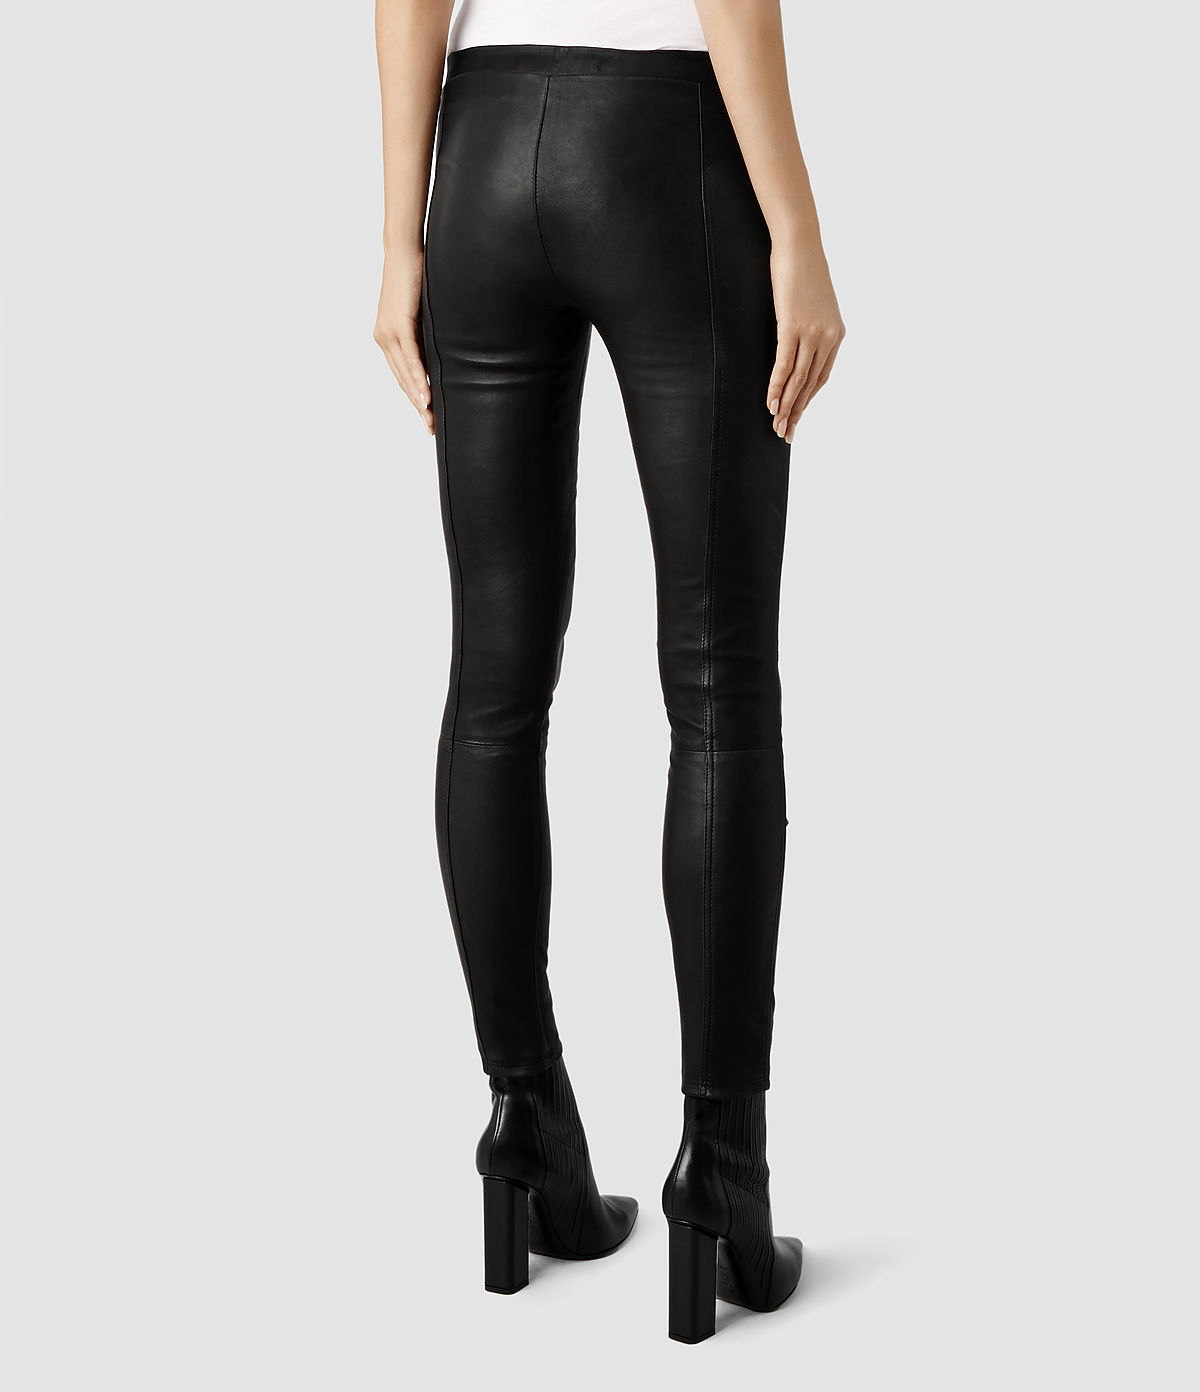 Allsaints Elm Leather Leggings in Black | Lyst